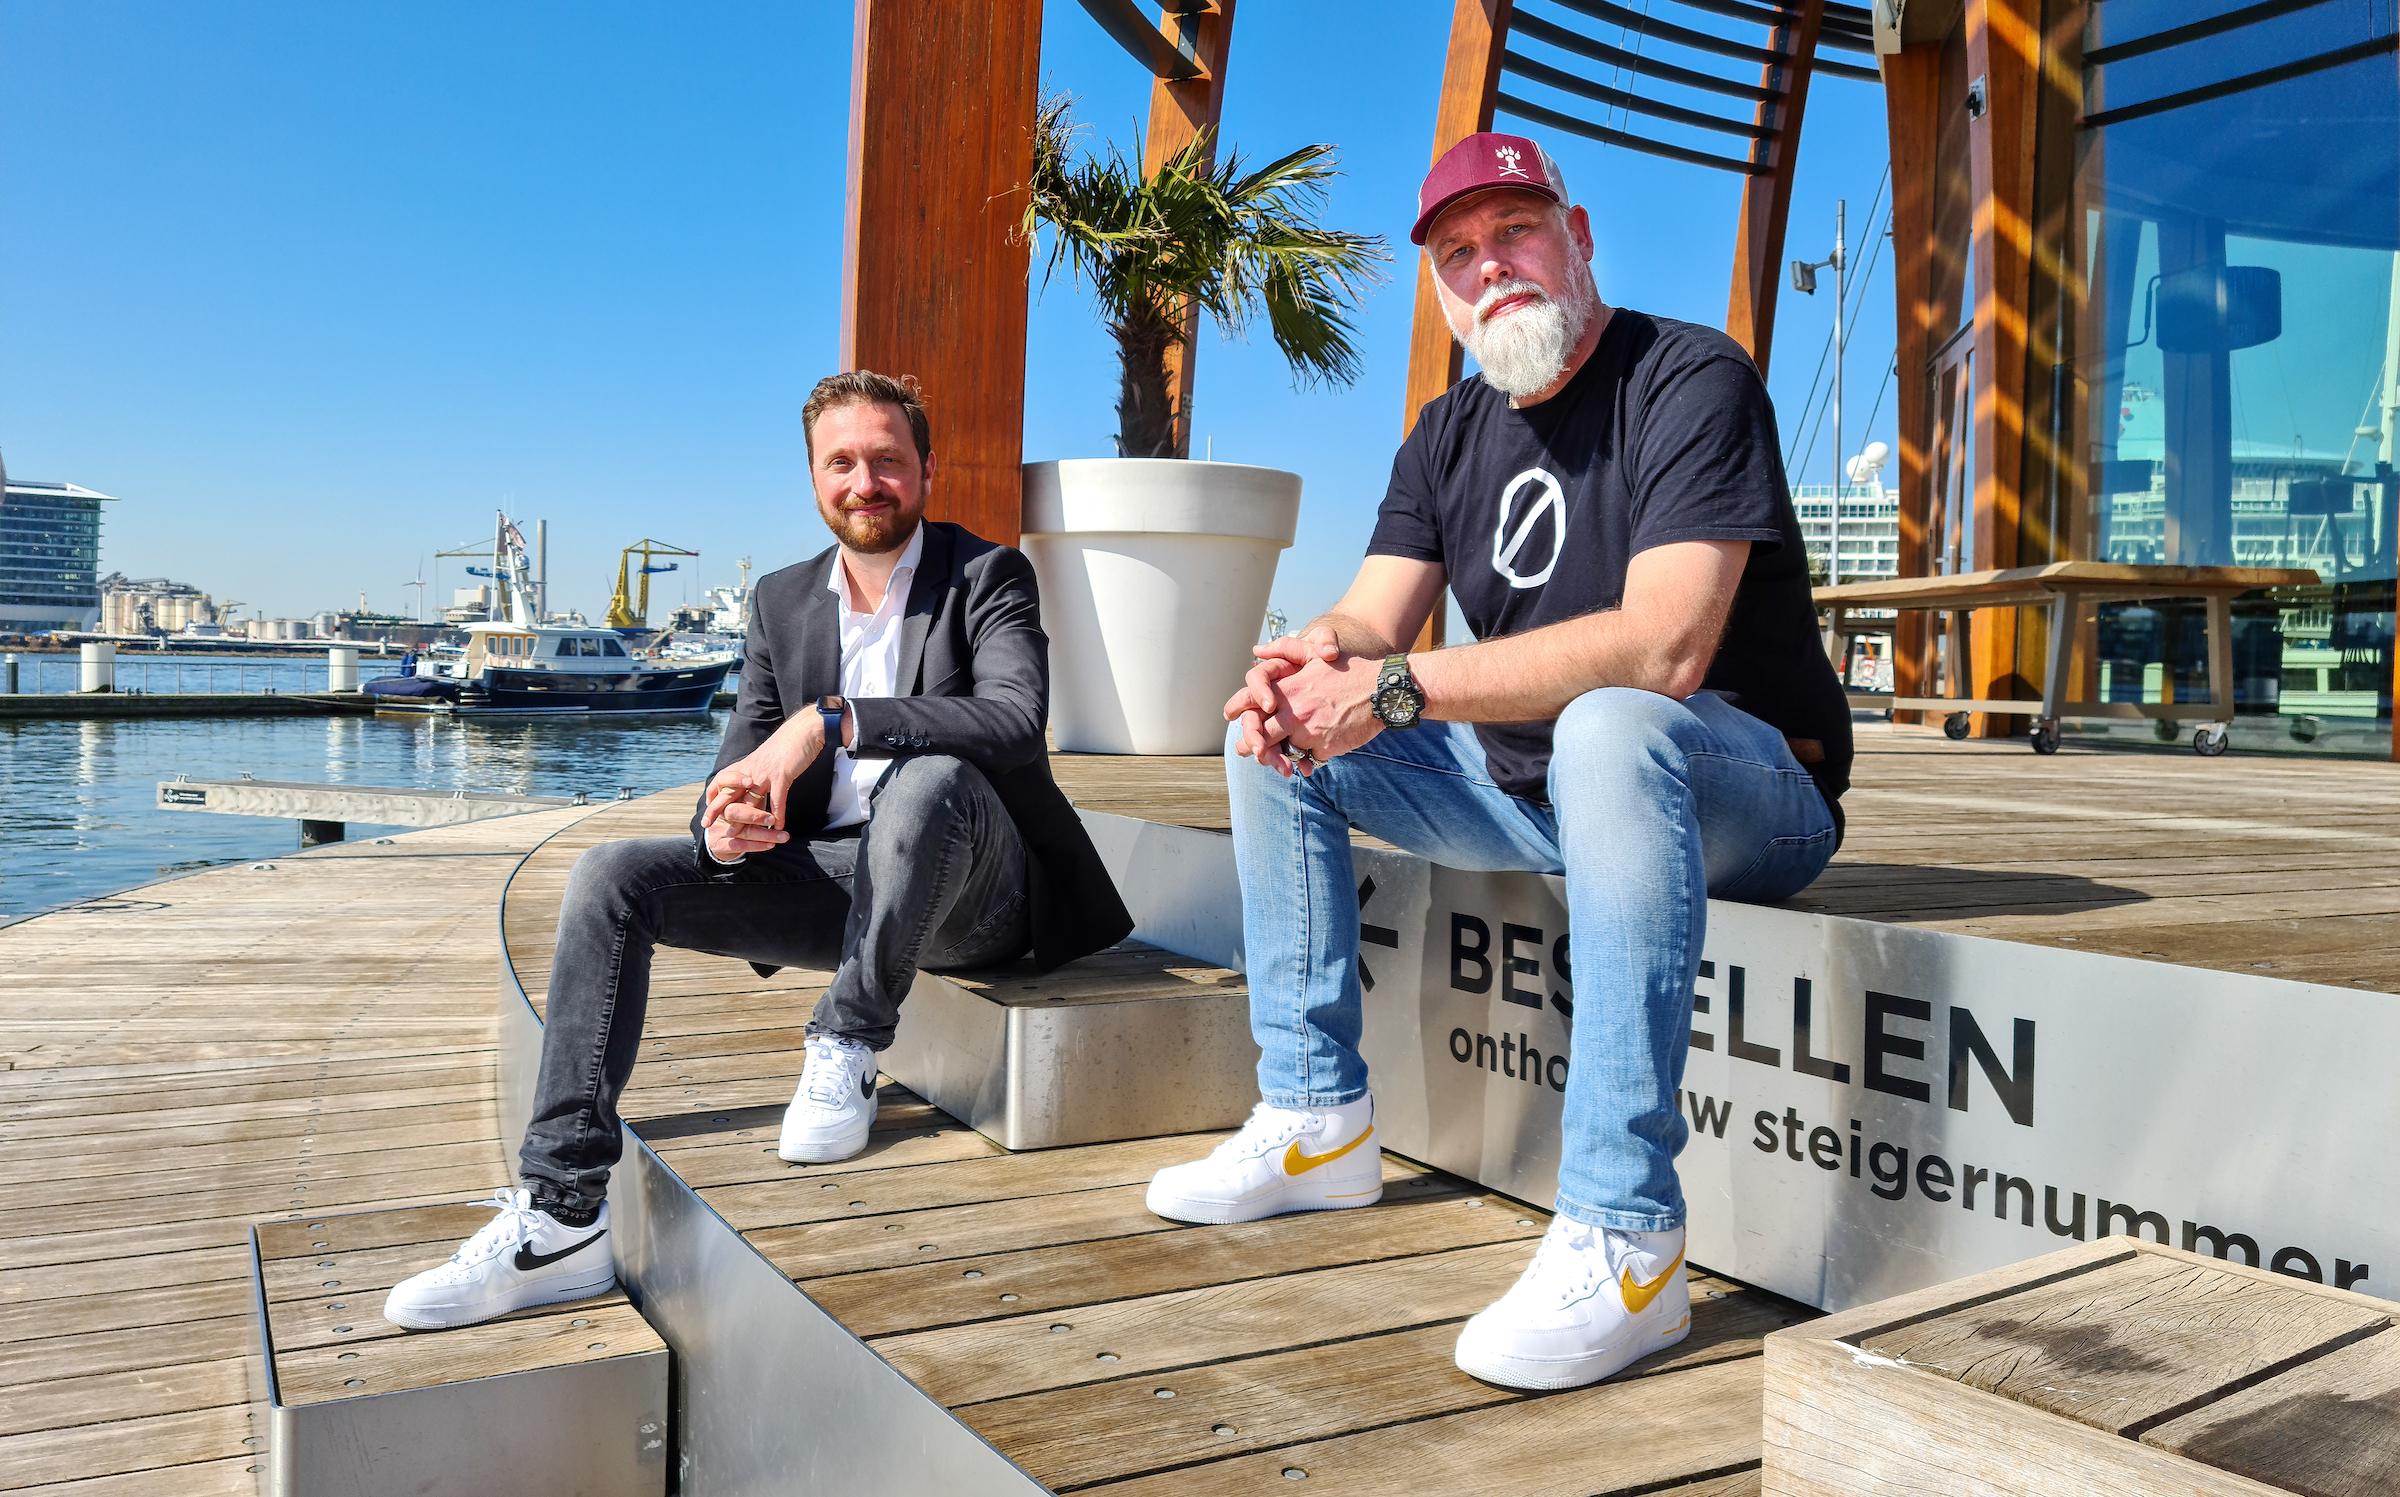 Zerocopter announces new CEO